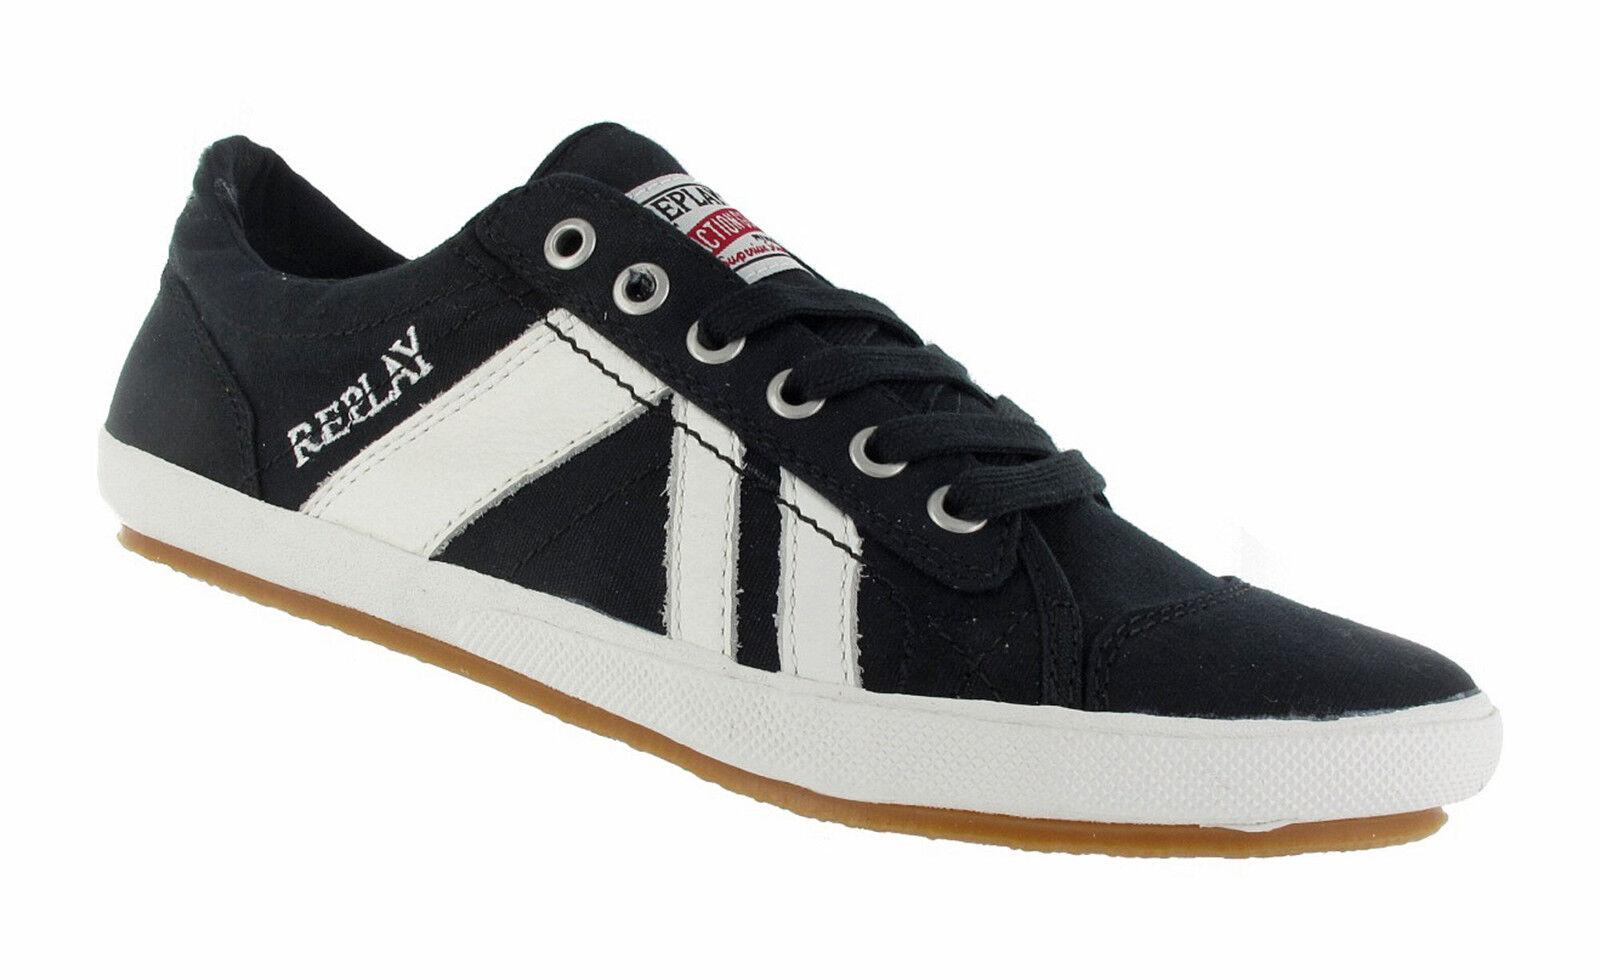 REPLAY Sneaker - Reichen C -  noir / Blanc  RV360001T